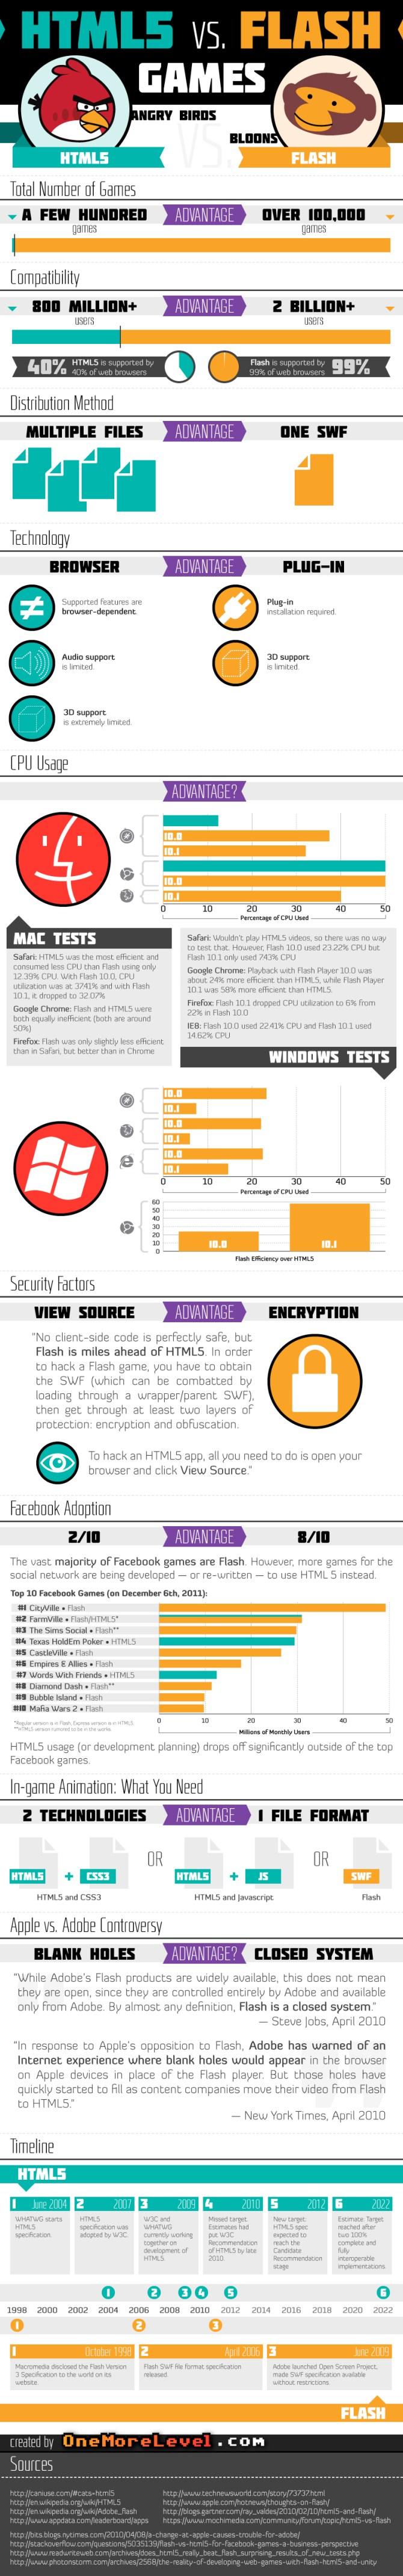 HTML5 vs Flash Games